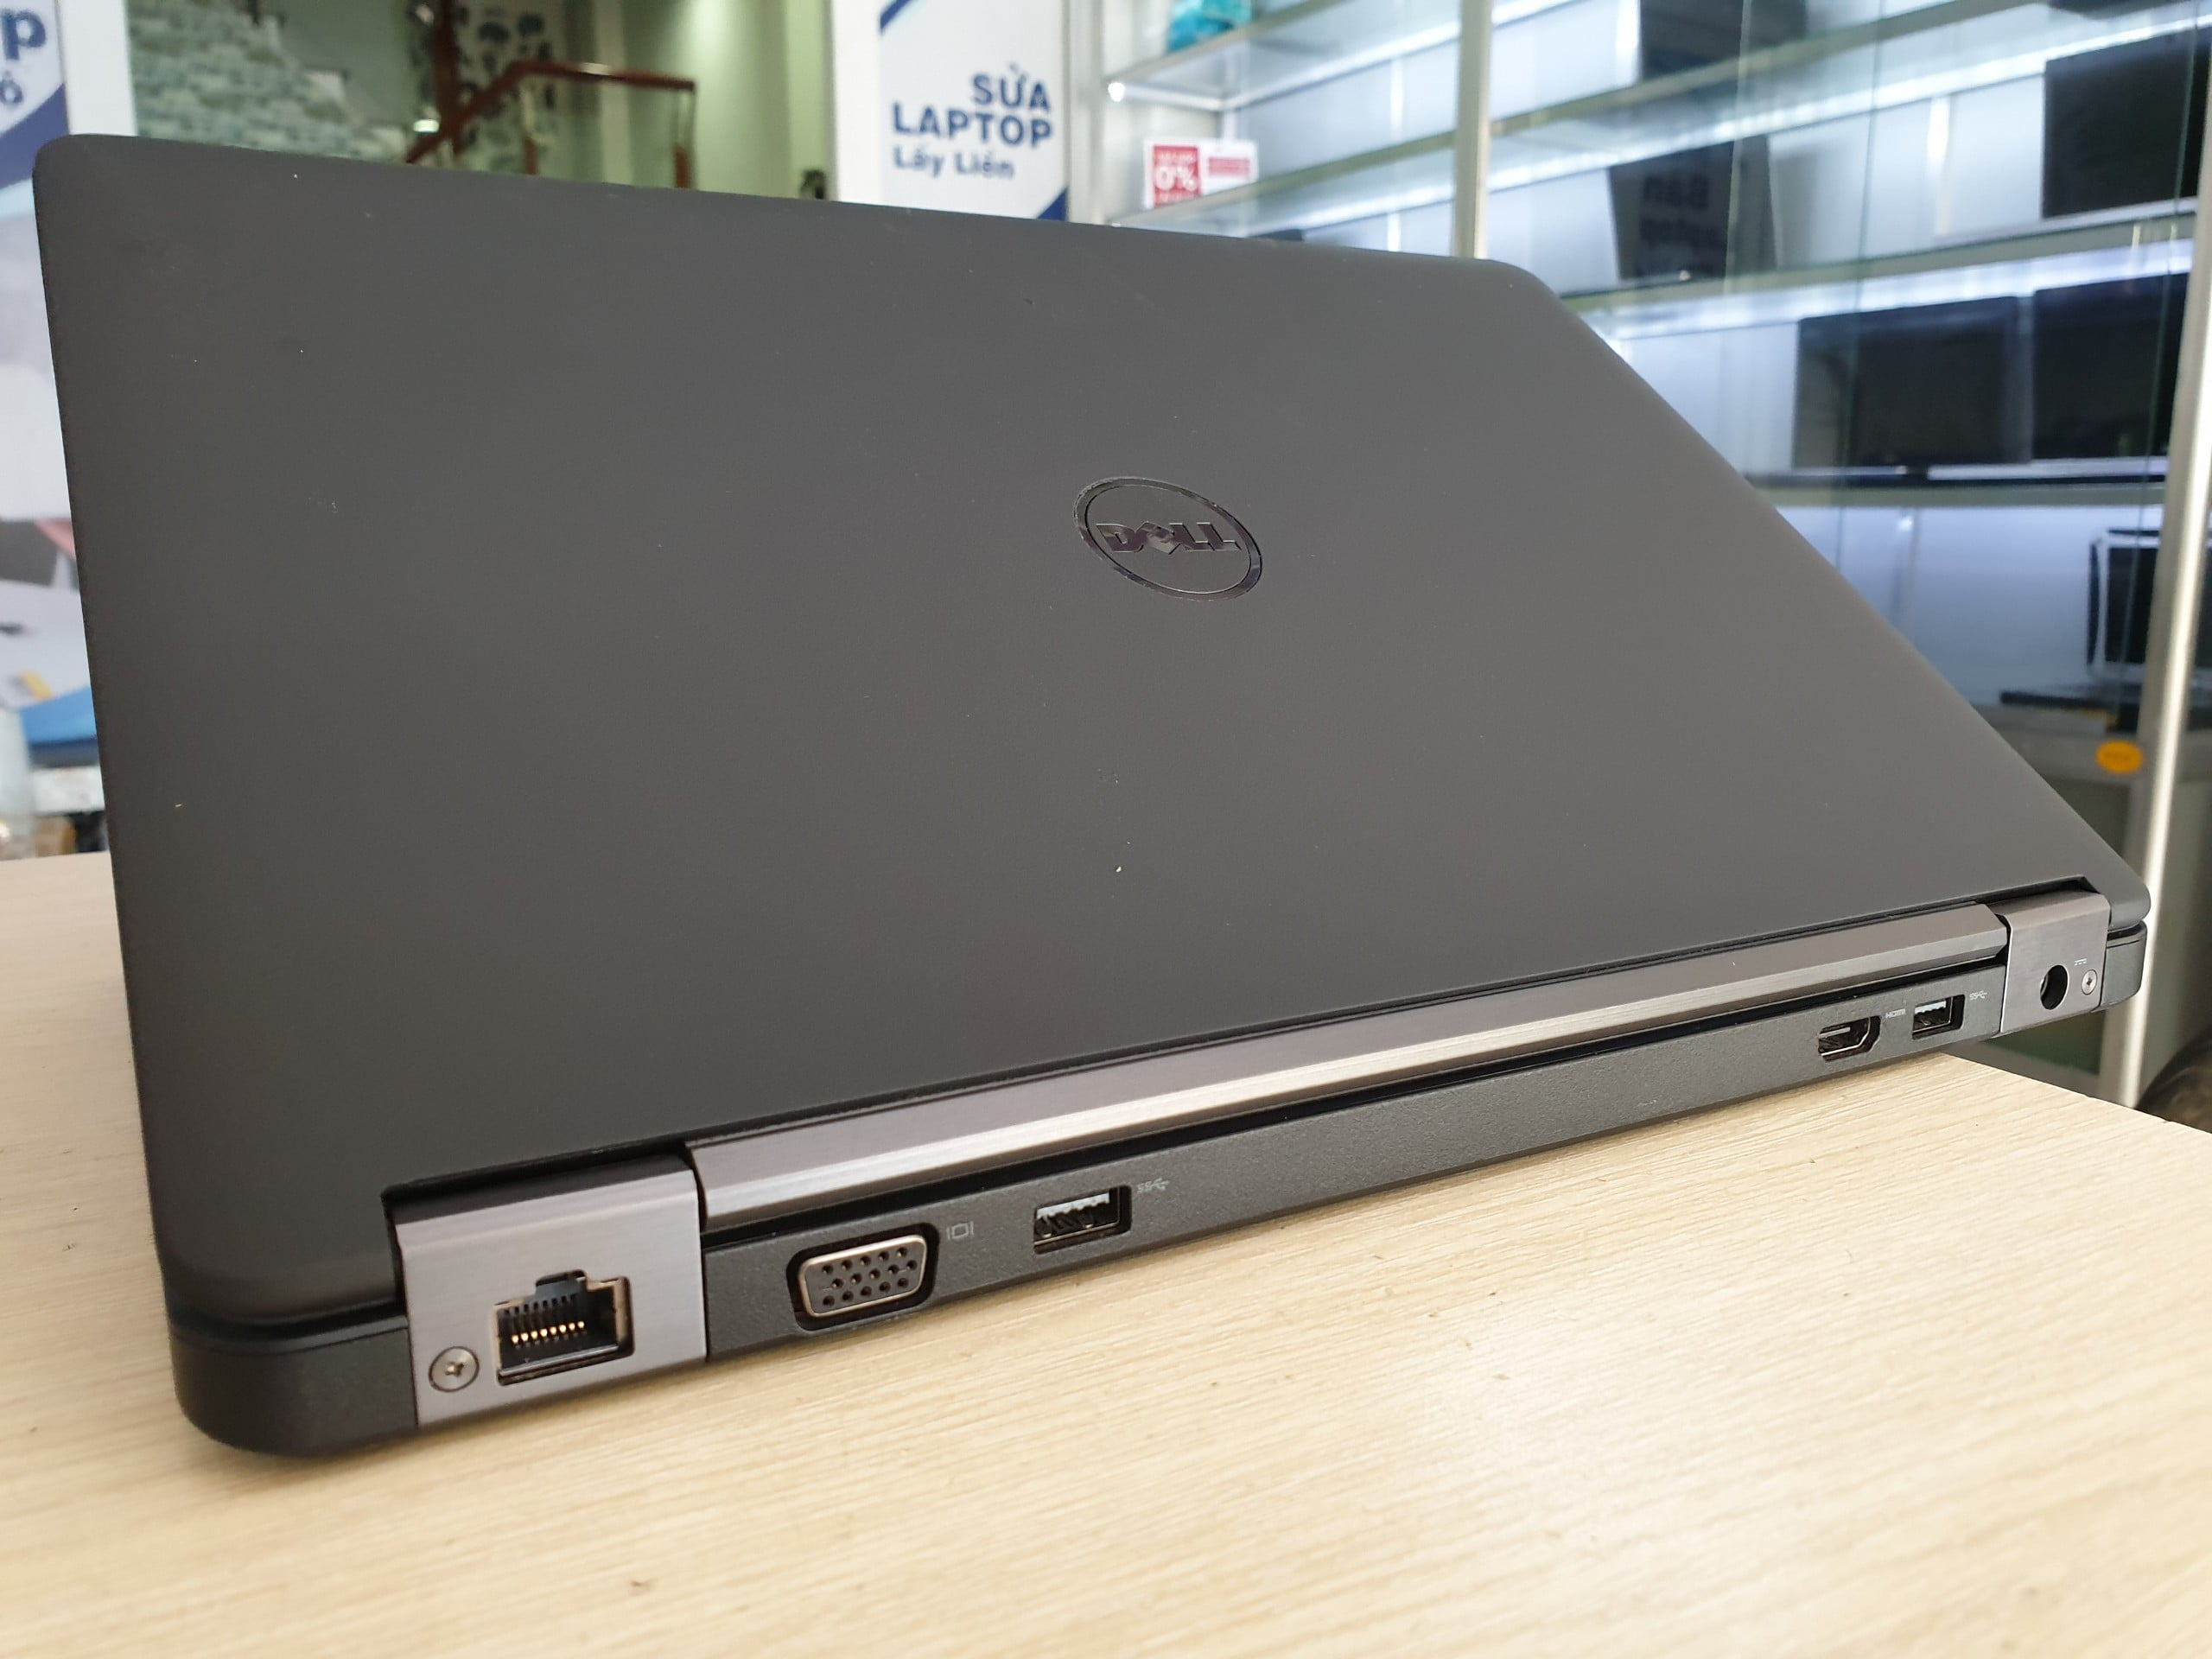 Kết quả hình ảnh cho Laptop Dell Latitude E5450 laptop 88